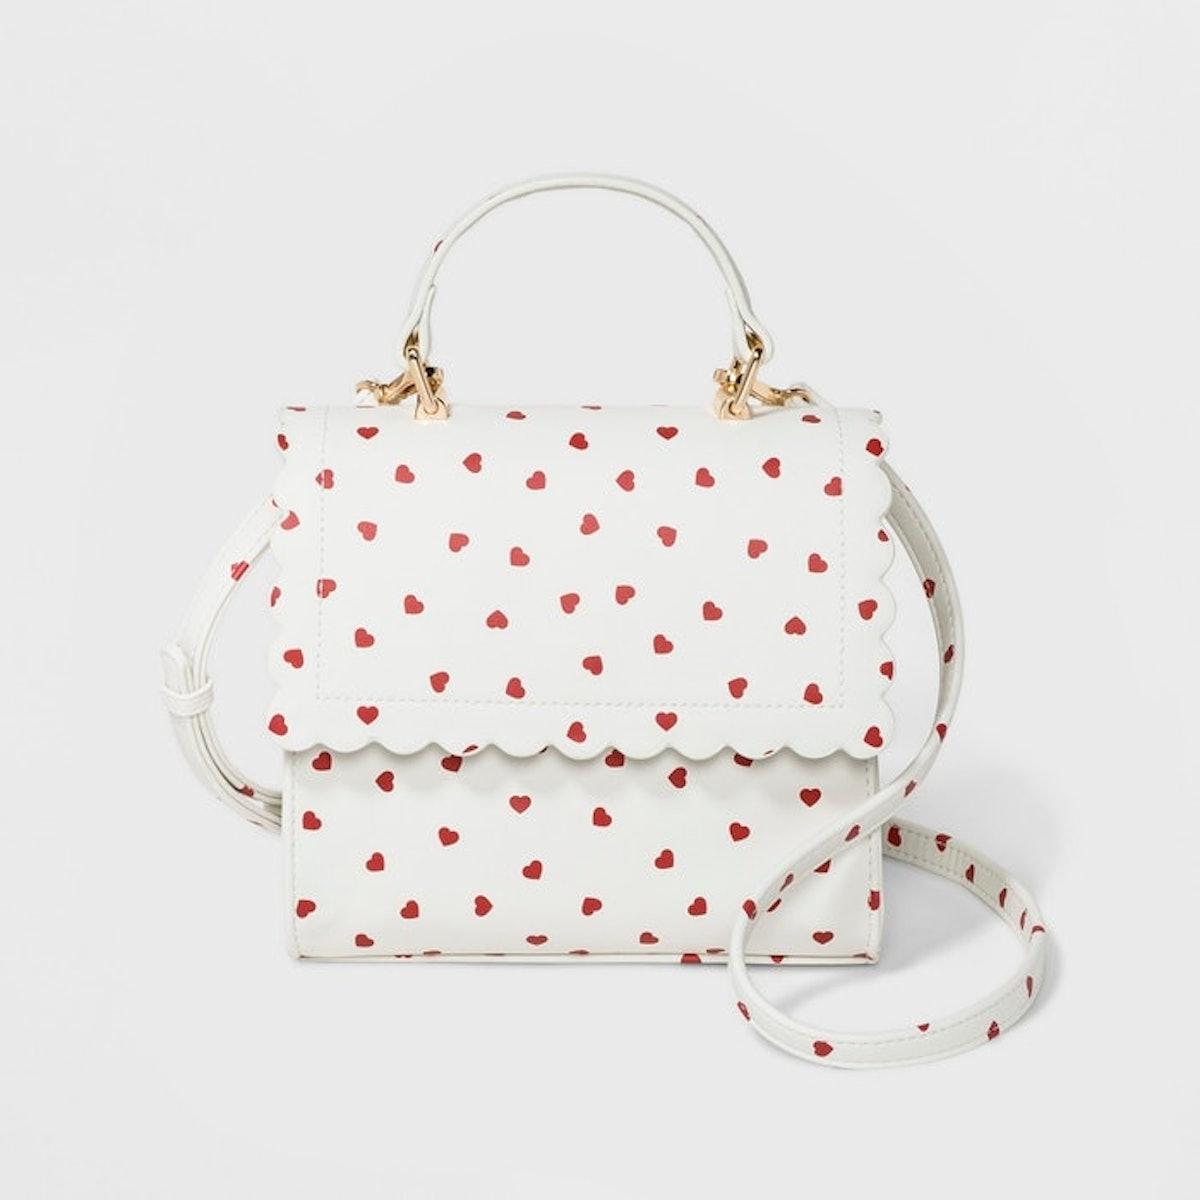 A New Day Ursula Crossbody Bag in White